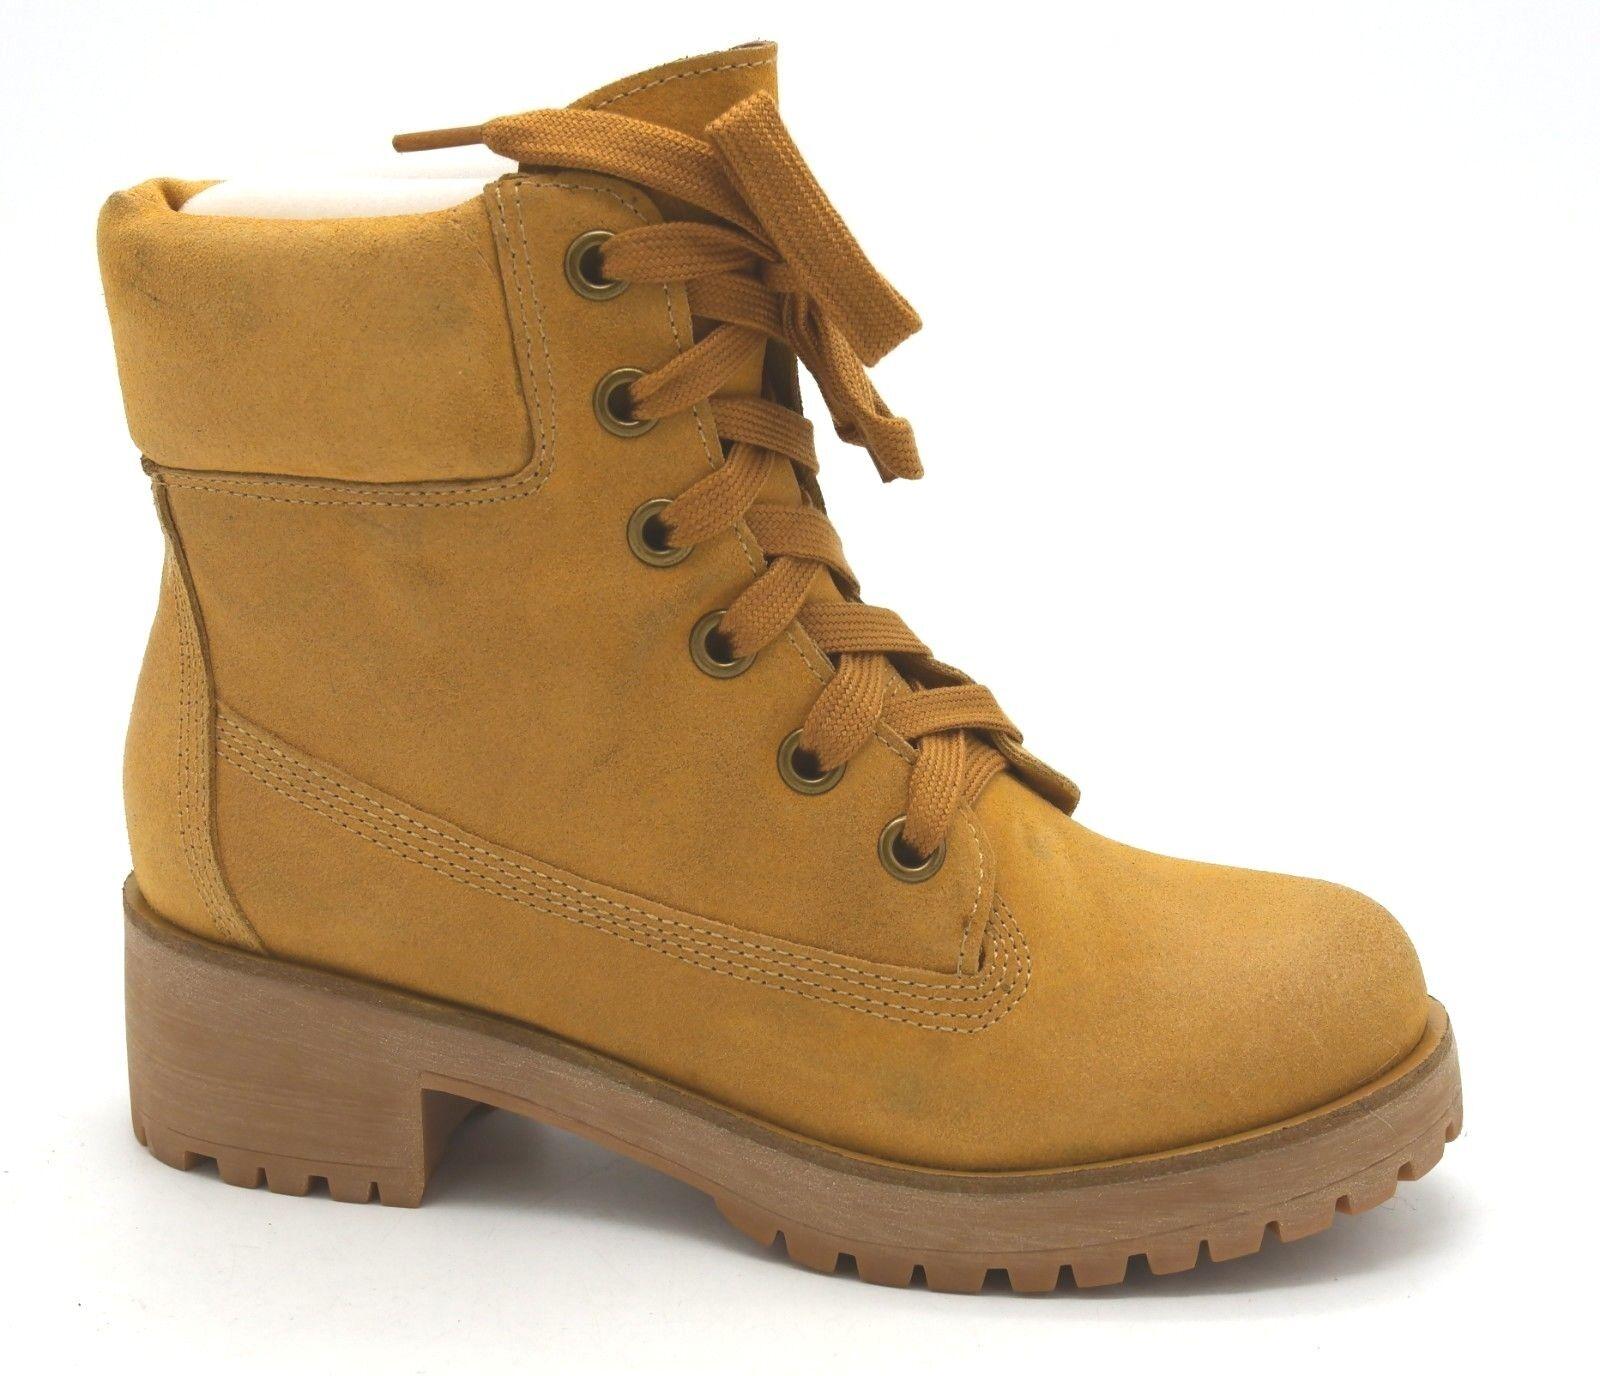 J6889 New donna  Lucky Brand Jinny 2 Dirty Suede Hiker giallo avvio 6 M  negozio d'offerta